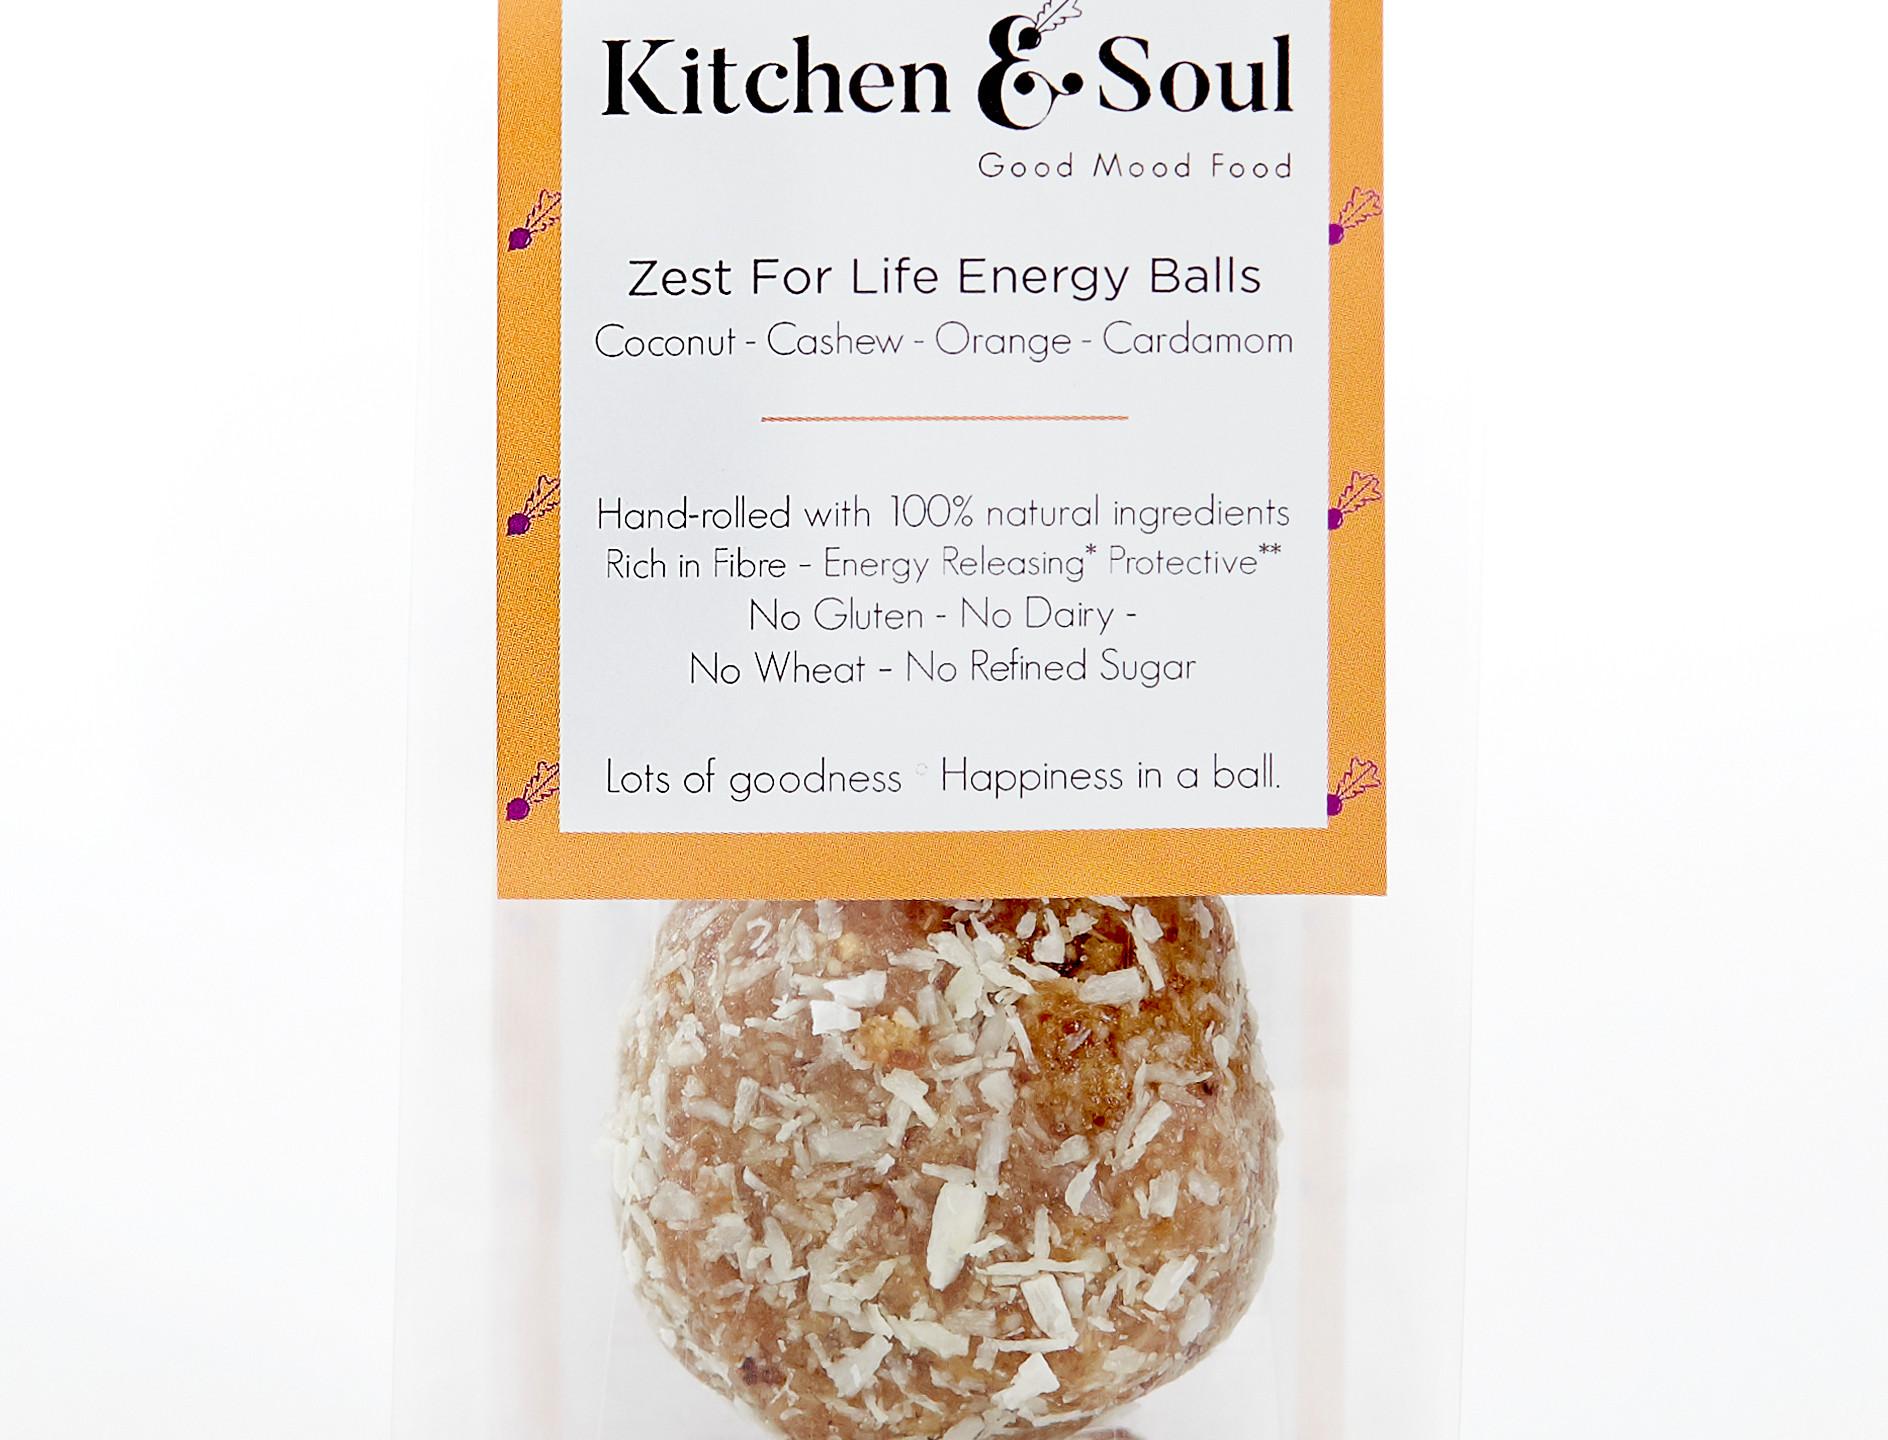 Zest For Life Energy Balls